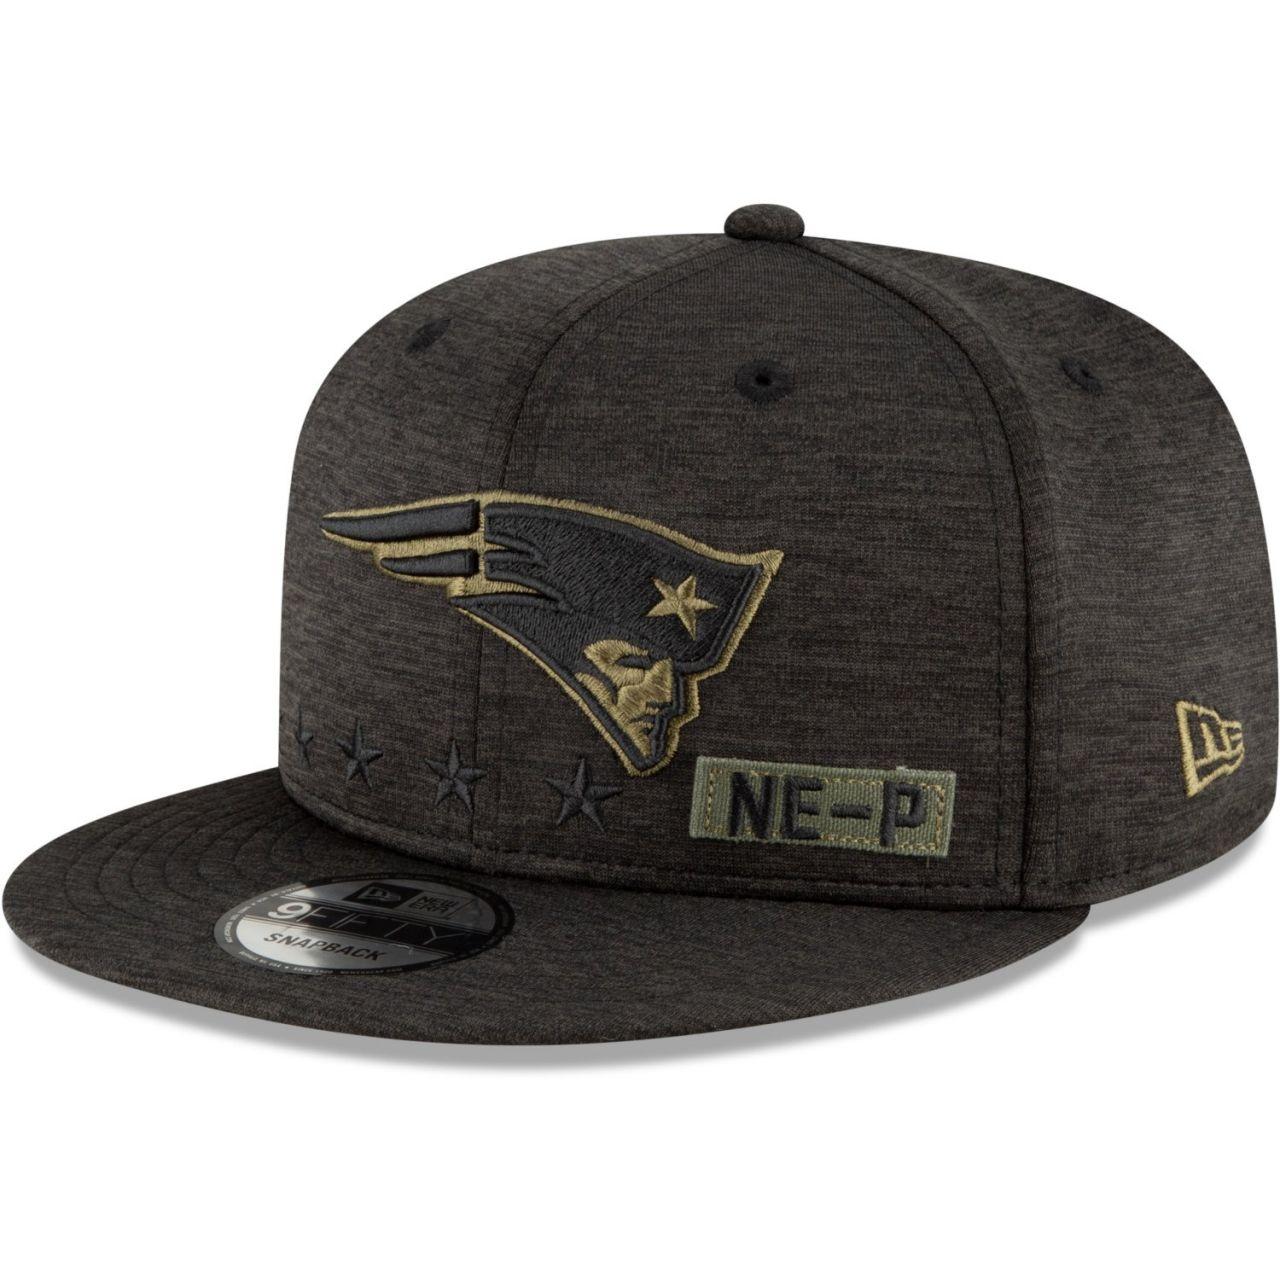 amfoo - New Era 9FIFTY Cap Salute to Service New England Patriots